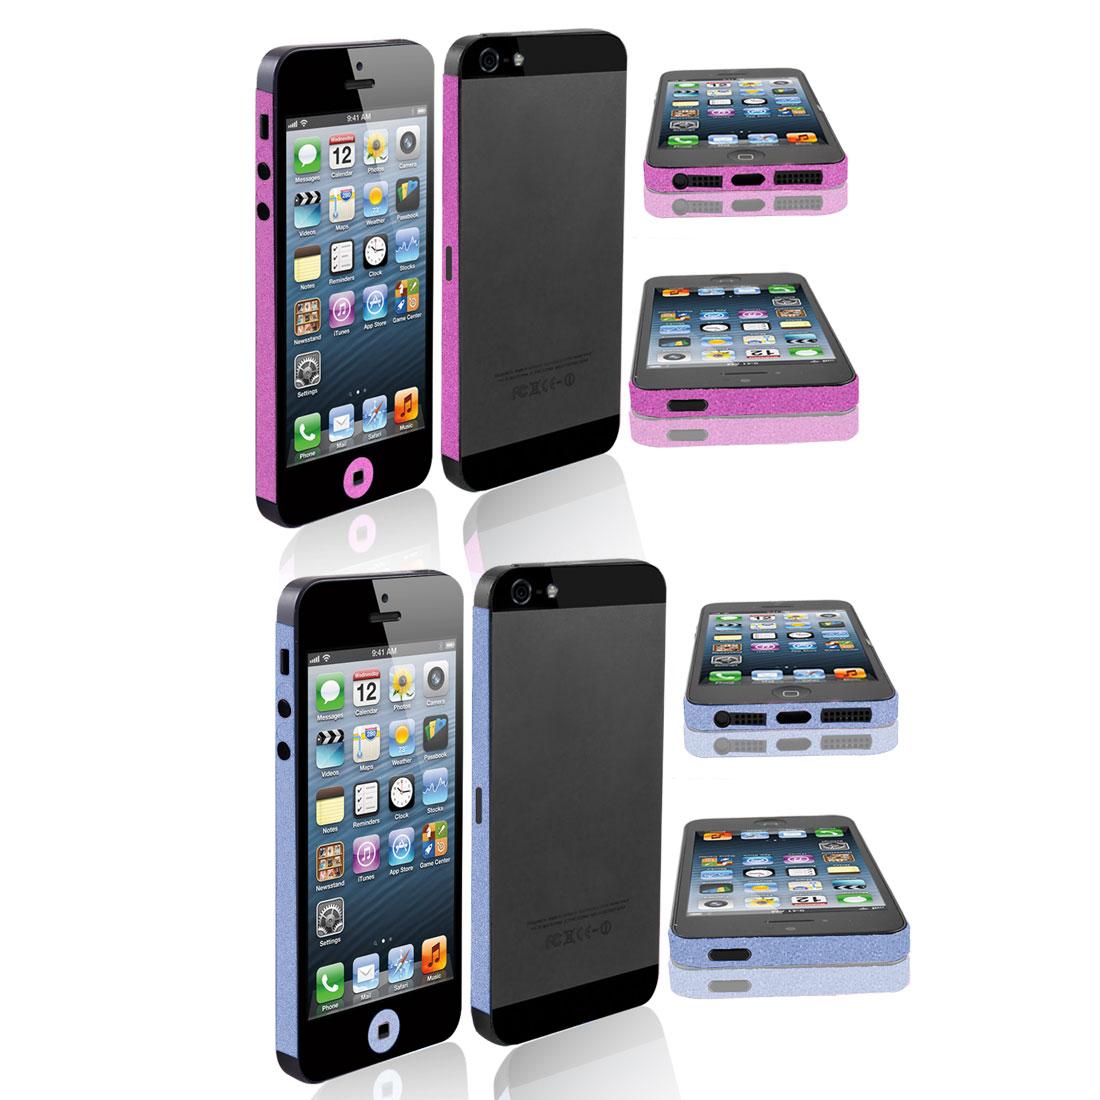 Glitter Vinyl Edge Wrap Decal Skin Sticker Fuchsia Blue 2 Pcs for iPhone 5 5G 5th